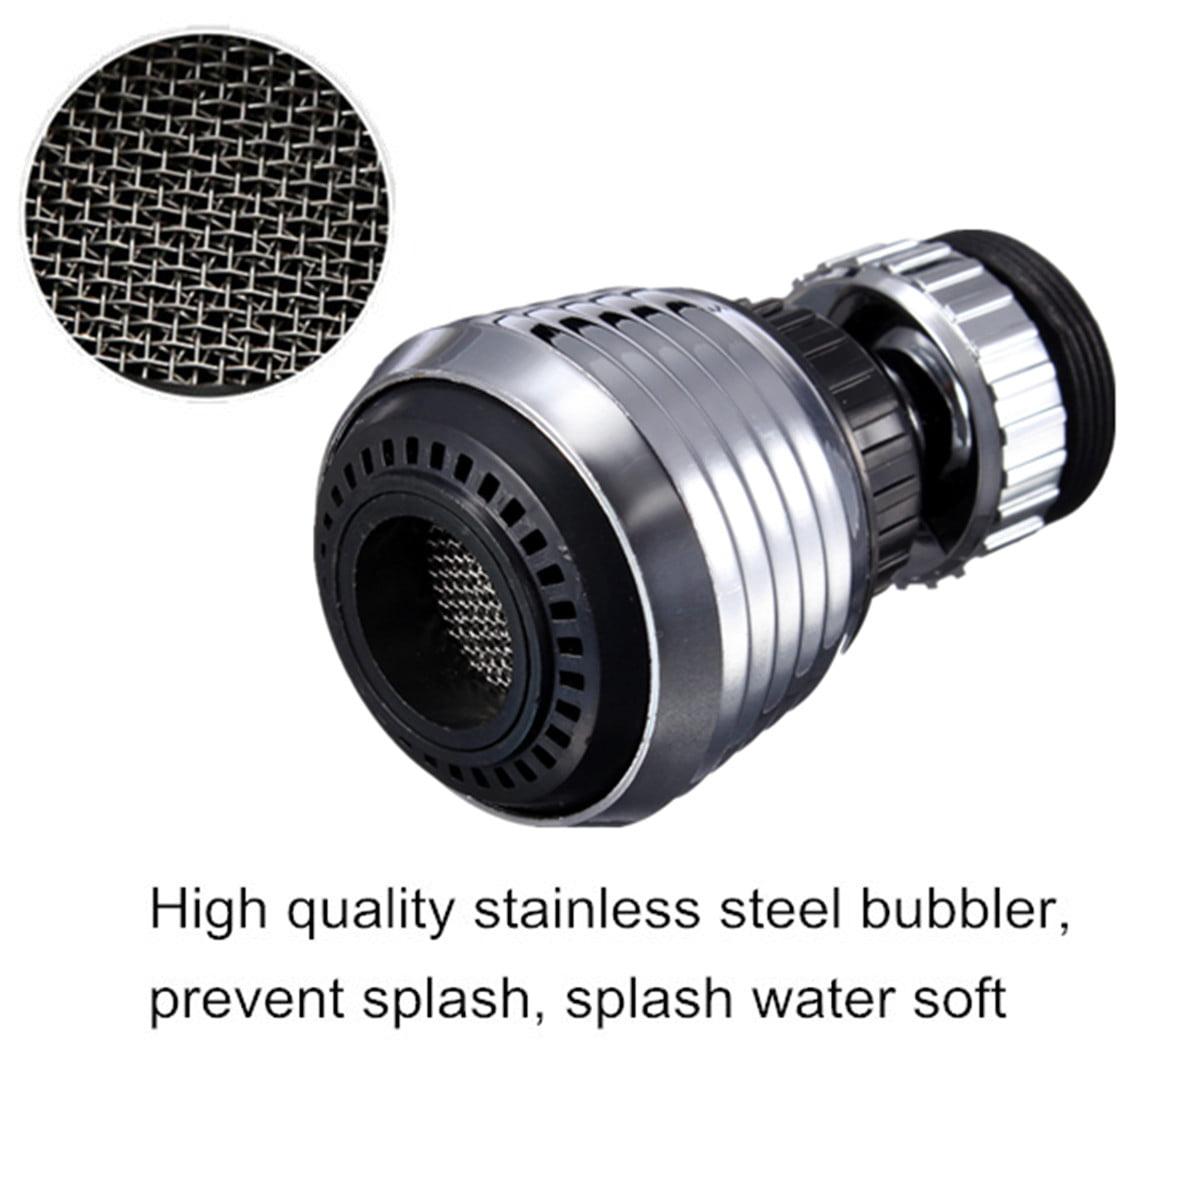 360° 2 modes Aerator Water Bubbler Head Saving Tap Spray Aerator ...